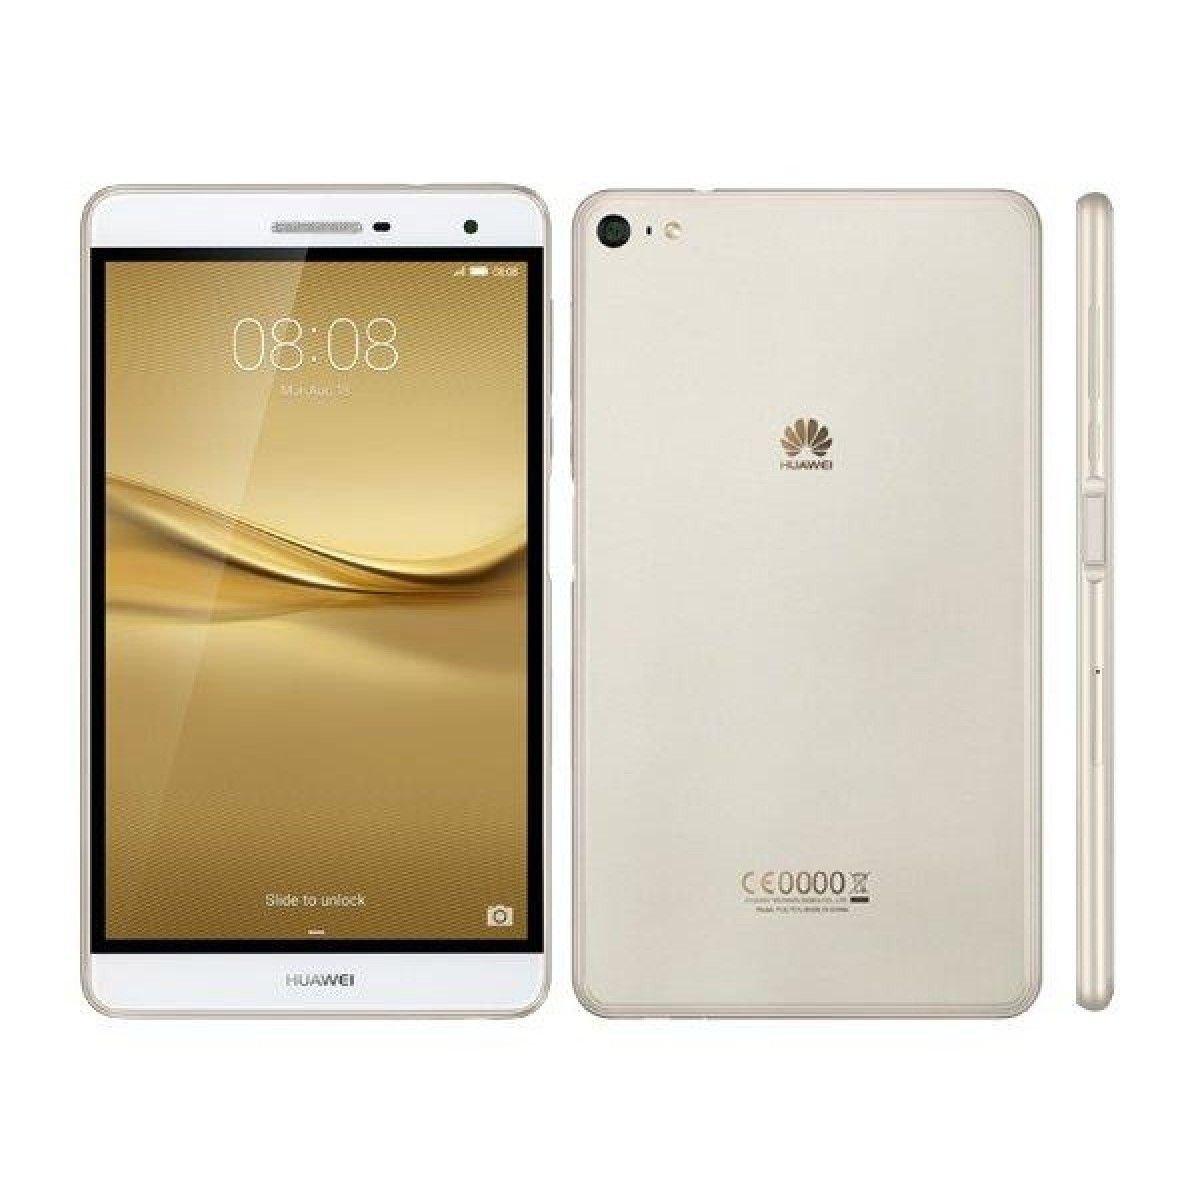 Huawei-MediaPad-T2-7-0-Pro-TUMOZELLİK-1200x1200.jpg